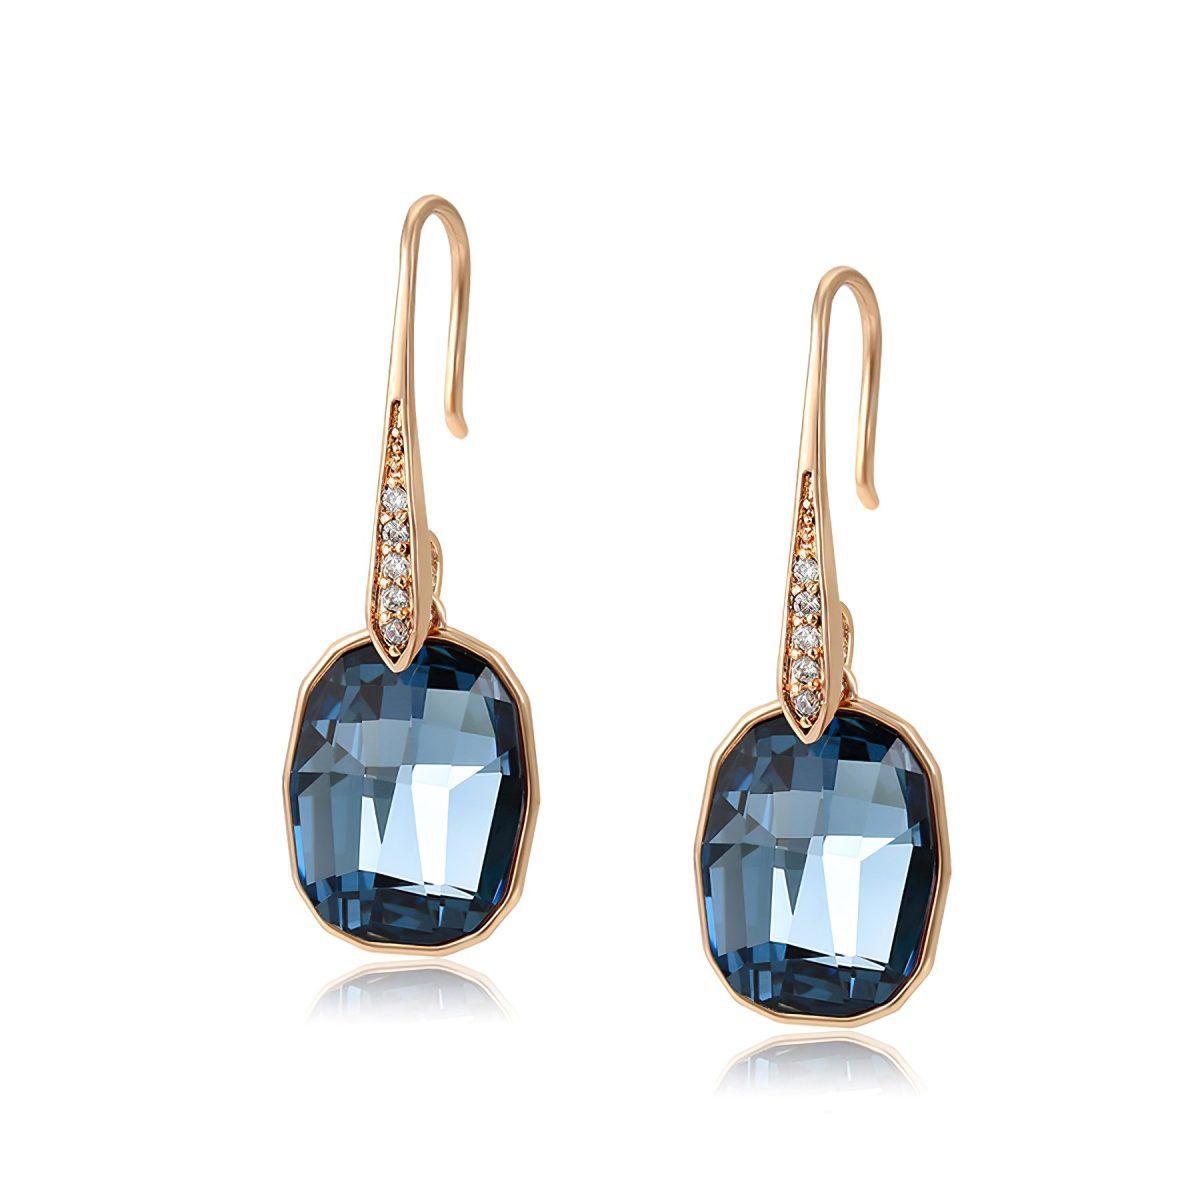 Серьги с тёмно-синими кристаллами